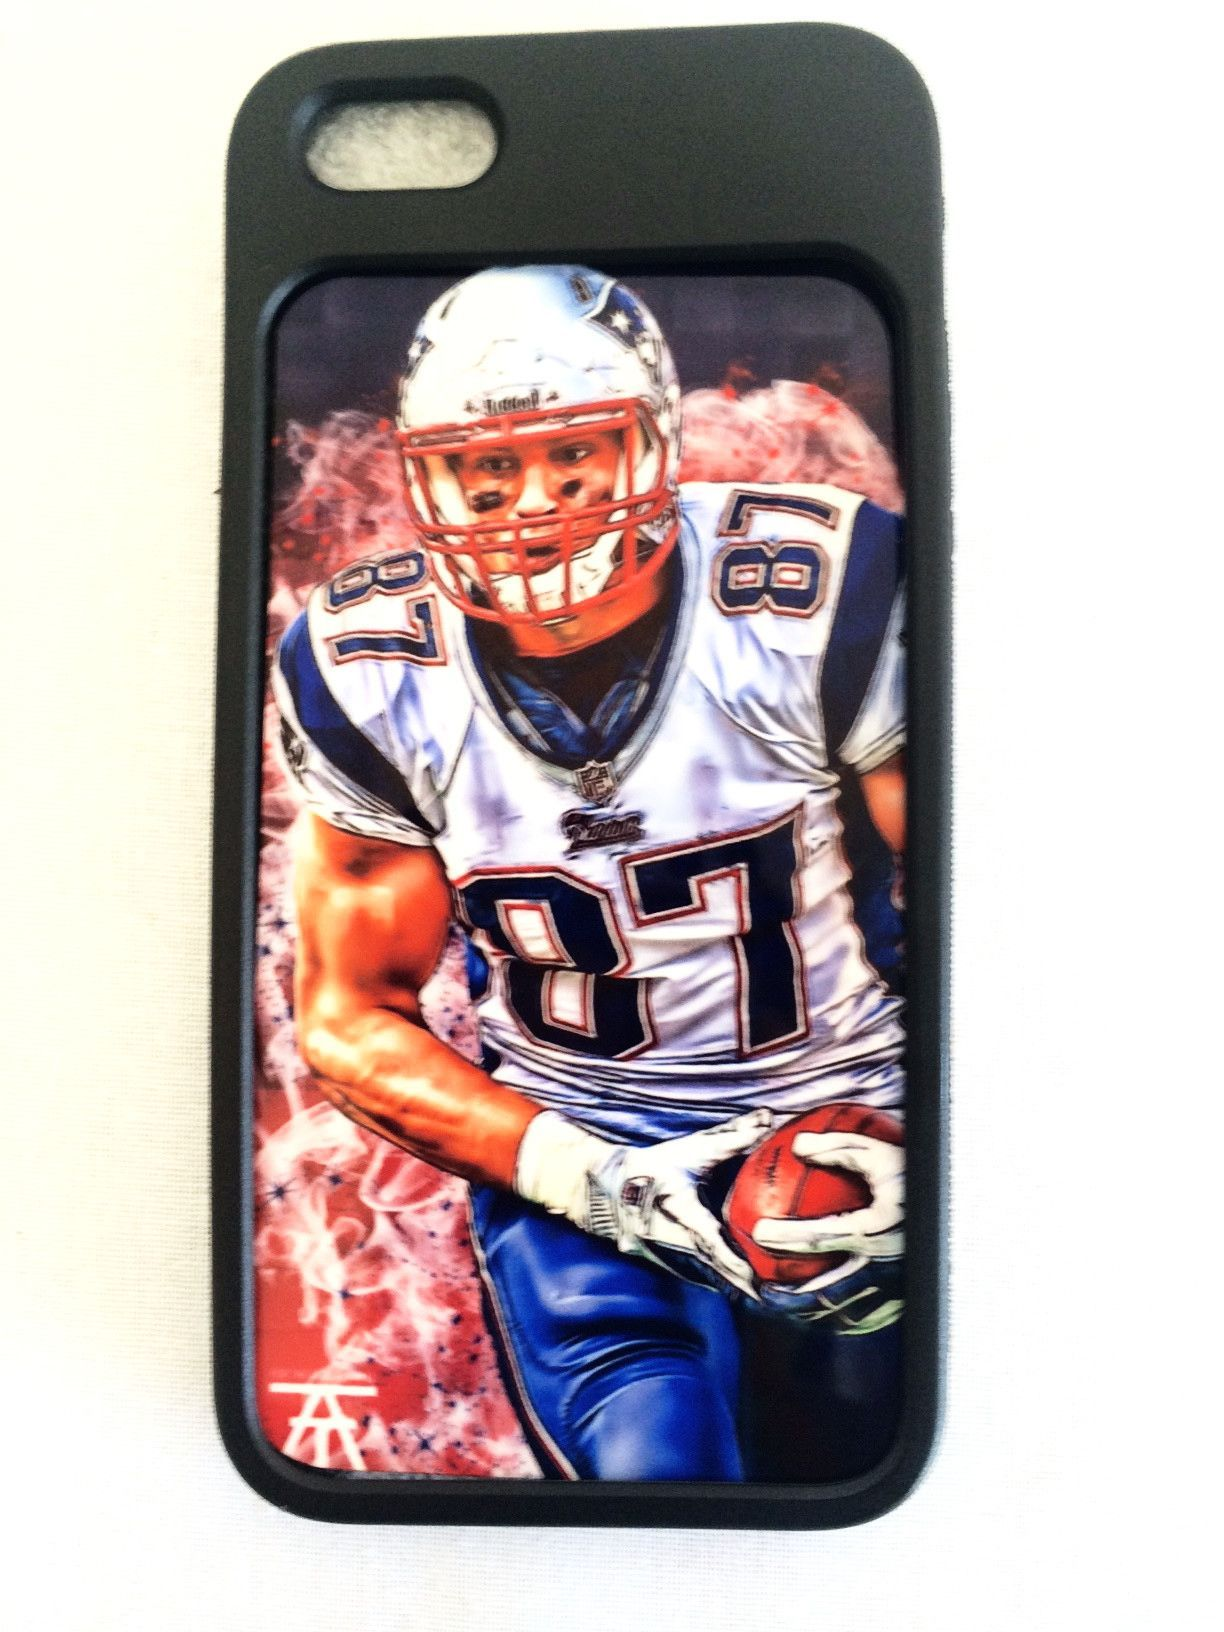 Rob Gronkowski iPhone Phone Case Iphone phone cases